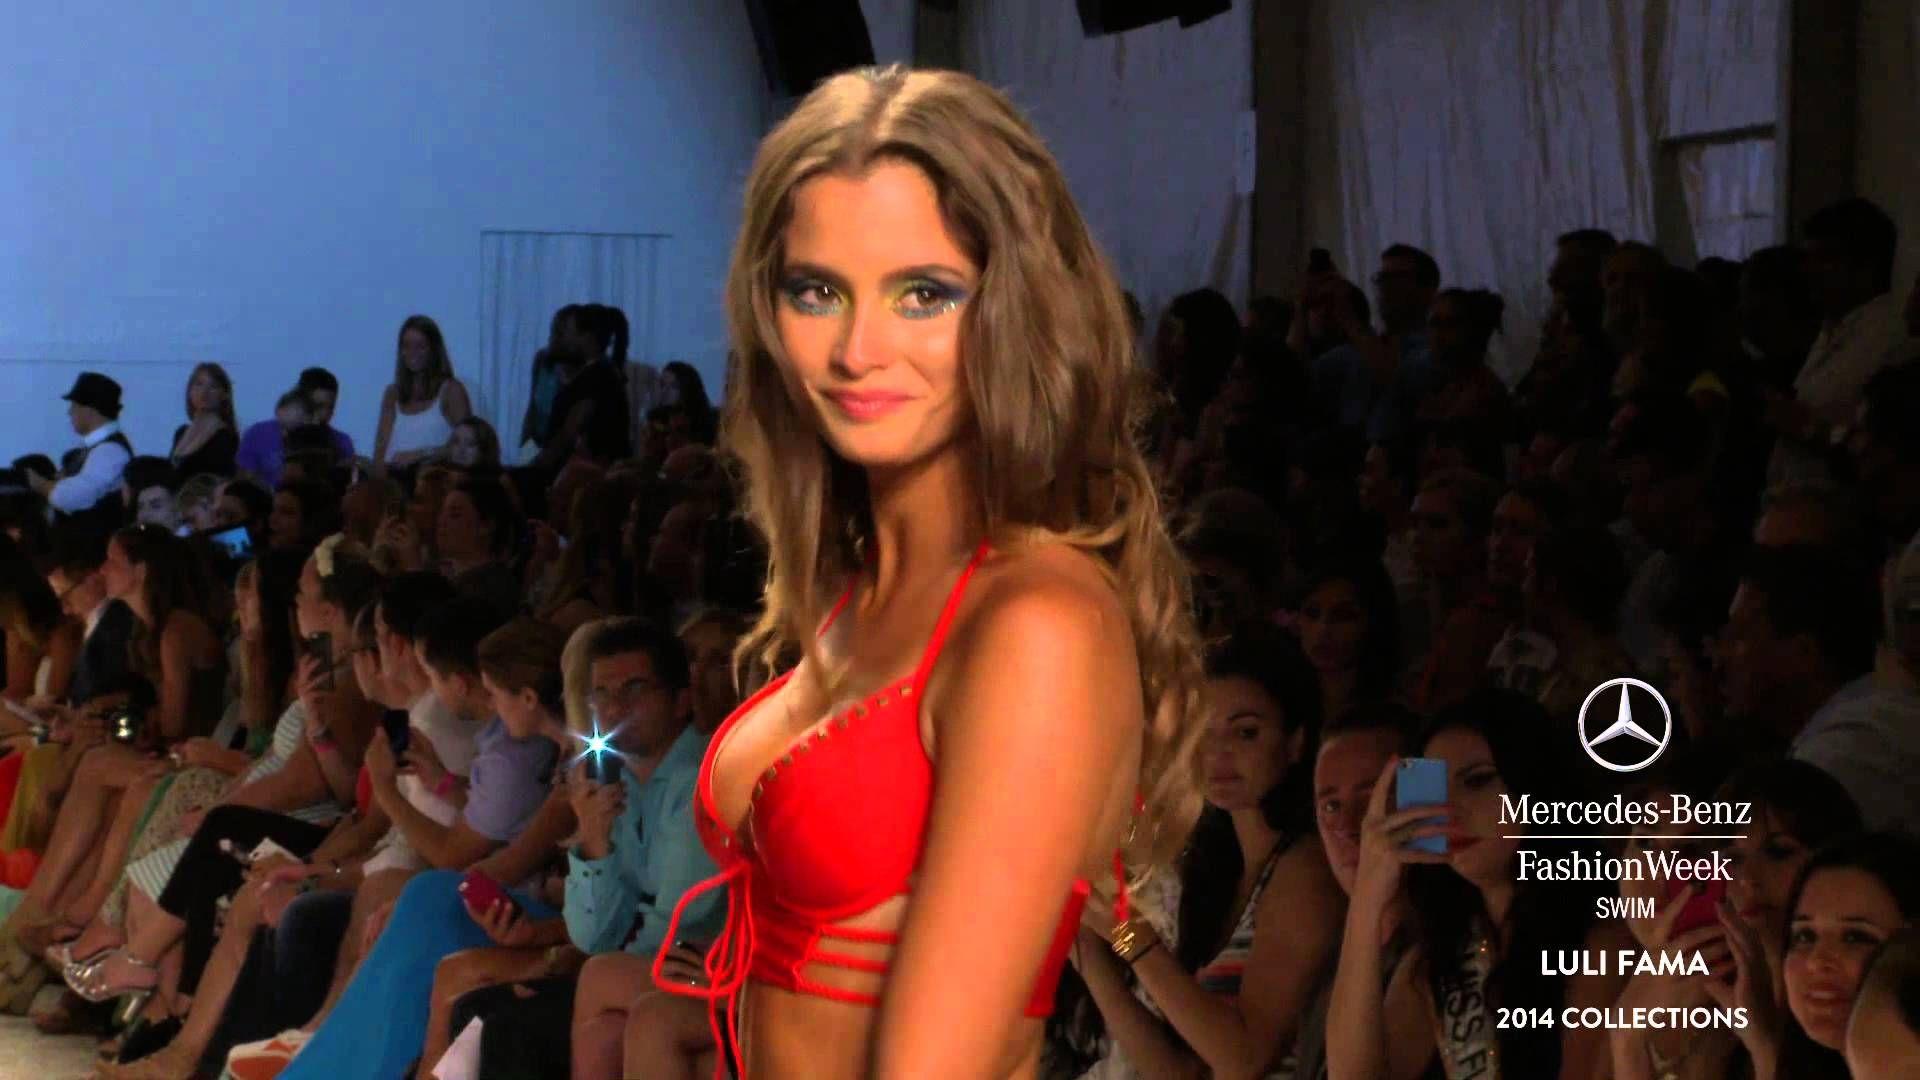 Fashion style Benz mercedes miami fashion week swim for woman